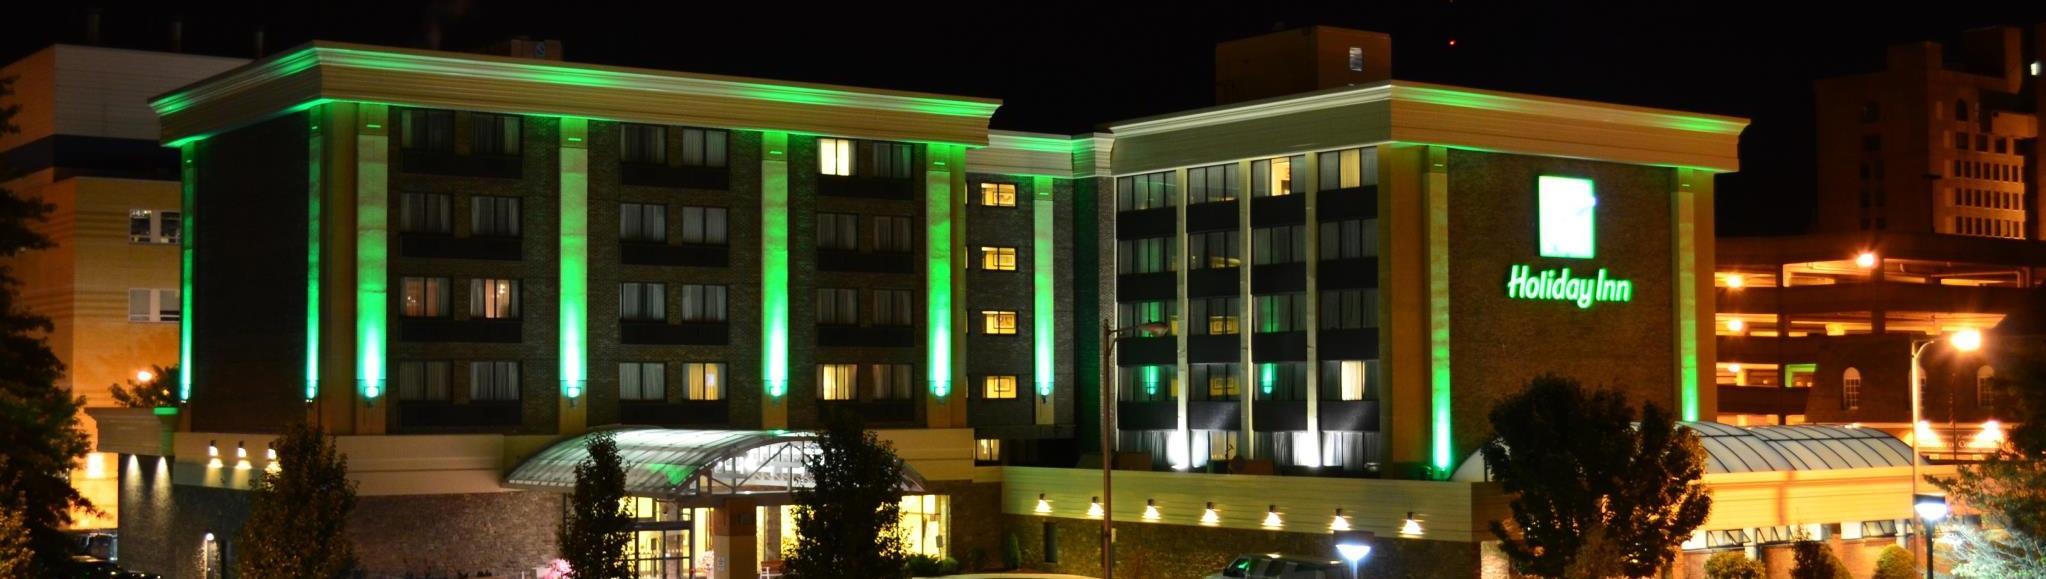 Hotels Visit Johnstown Pennsylvania